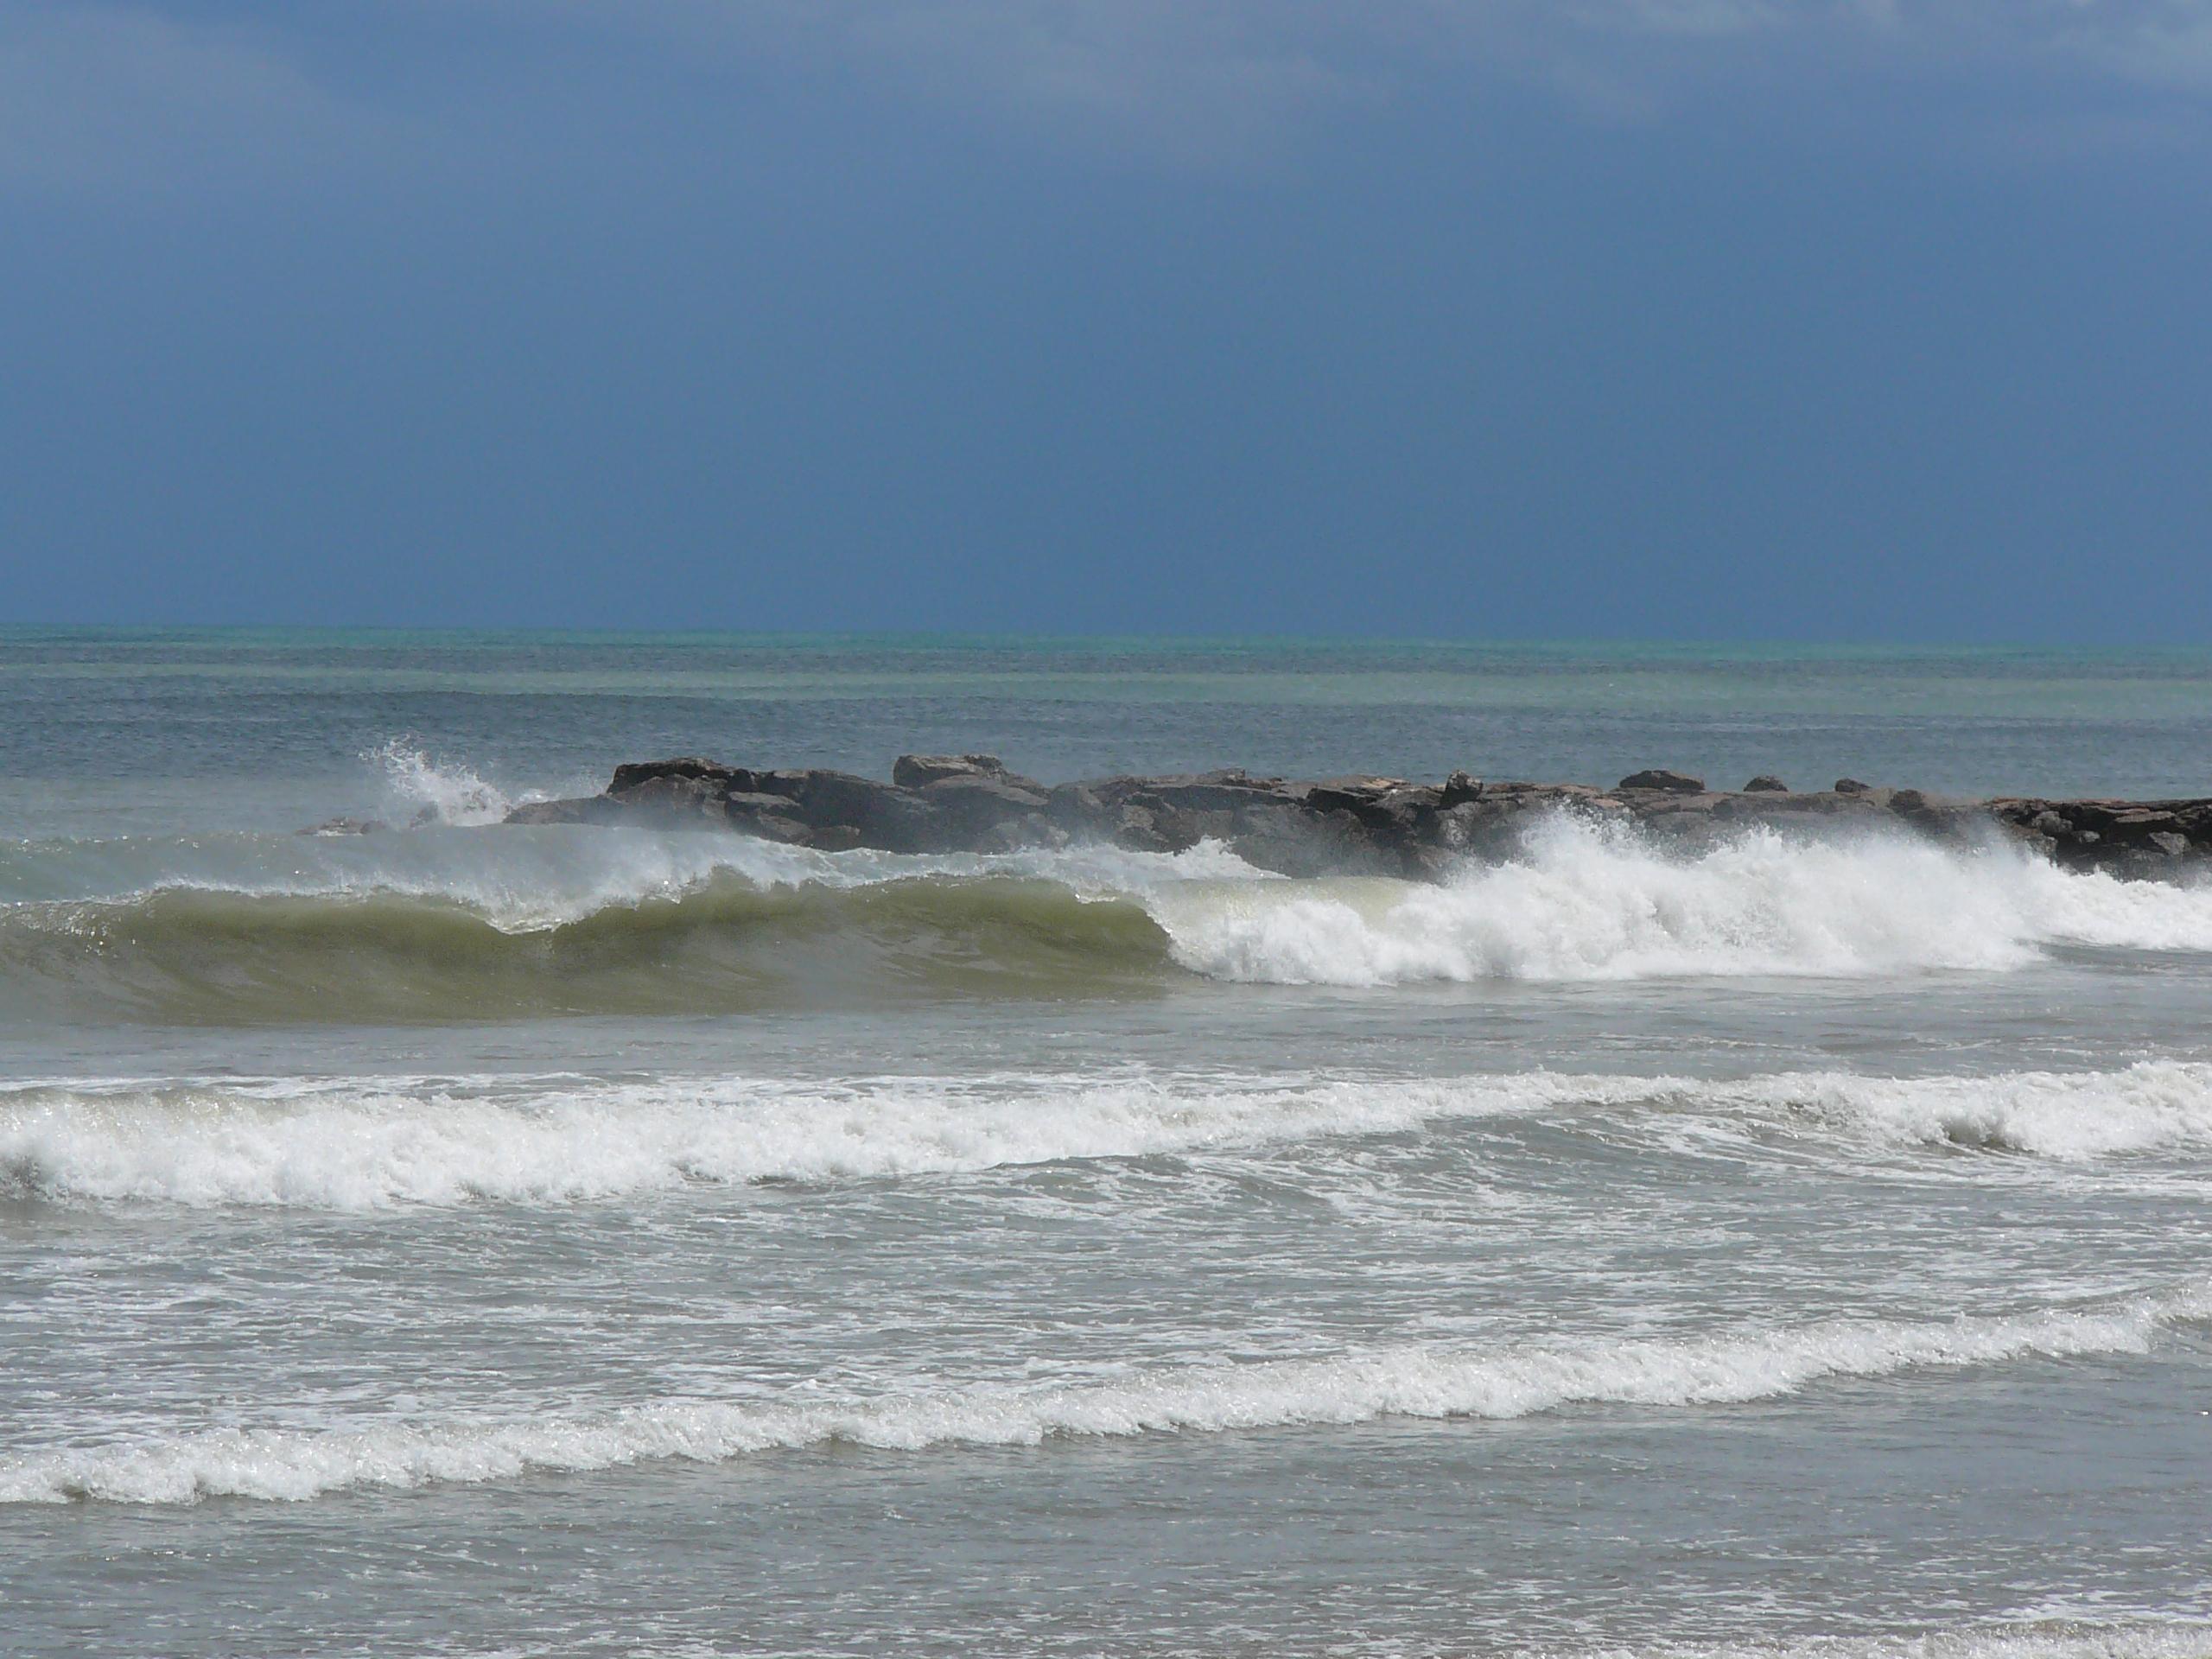 Foto playa Port Saplaya. Las olas del mar...